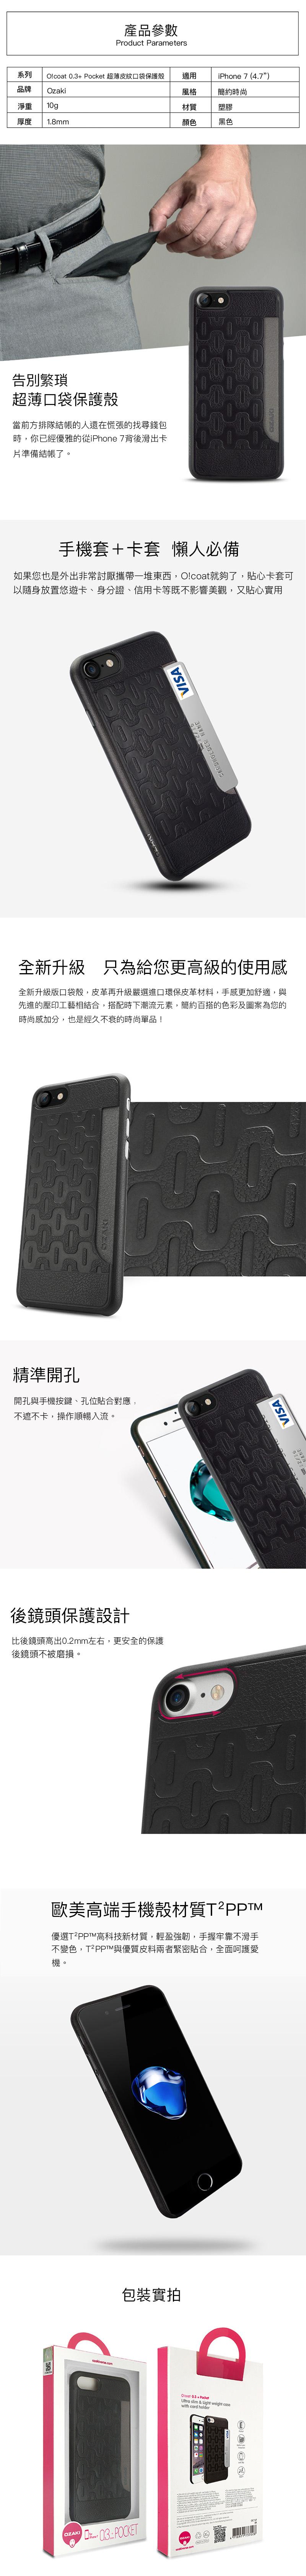 Ozaki O!coat 0.3+ Pocket 超薄皮紋口袋保護殼 for iPhone7